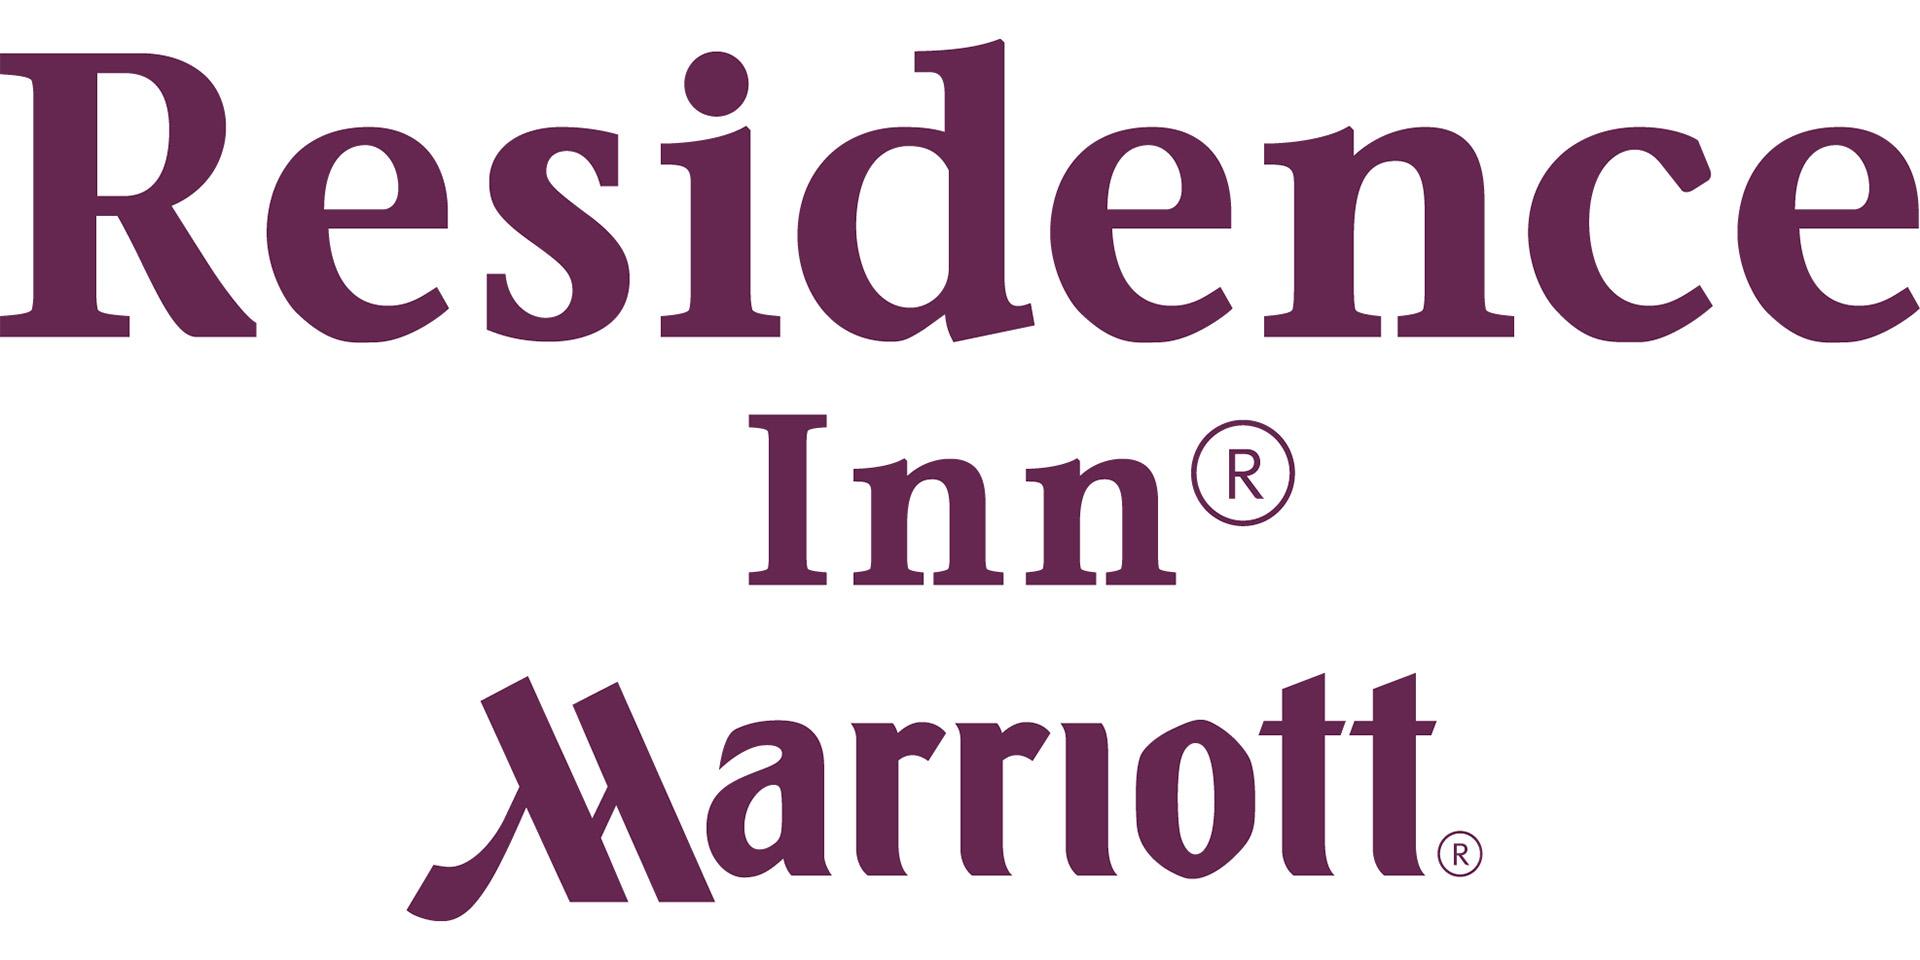 Residence Inn Mariott